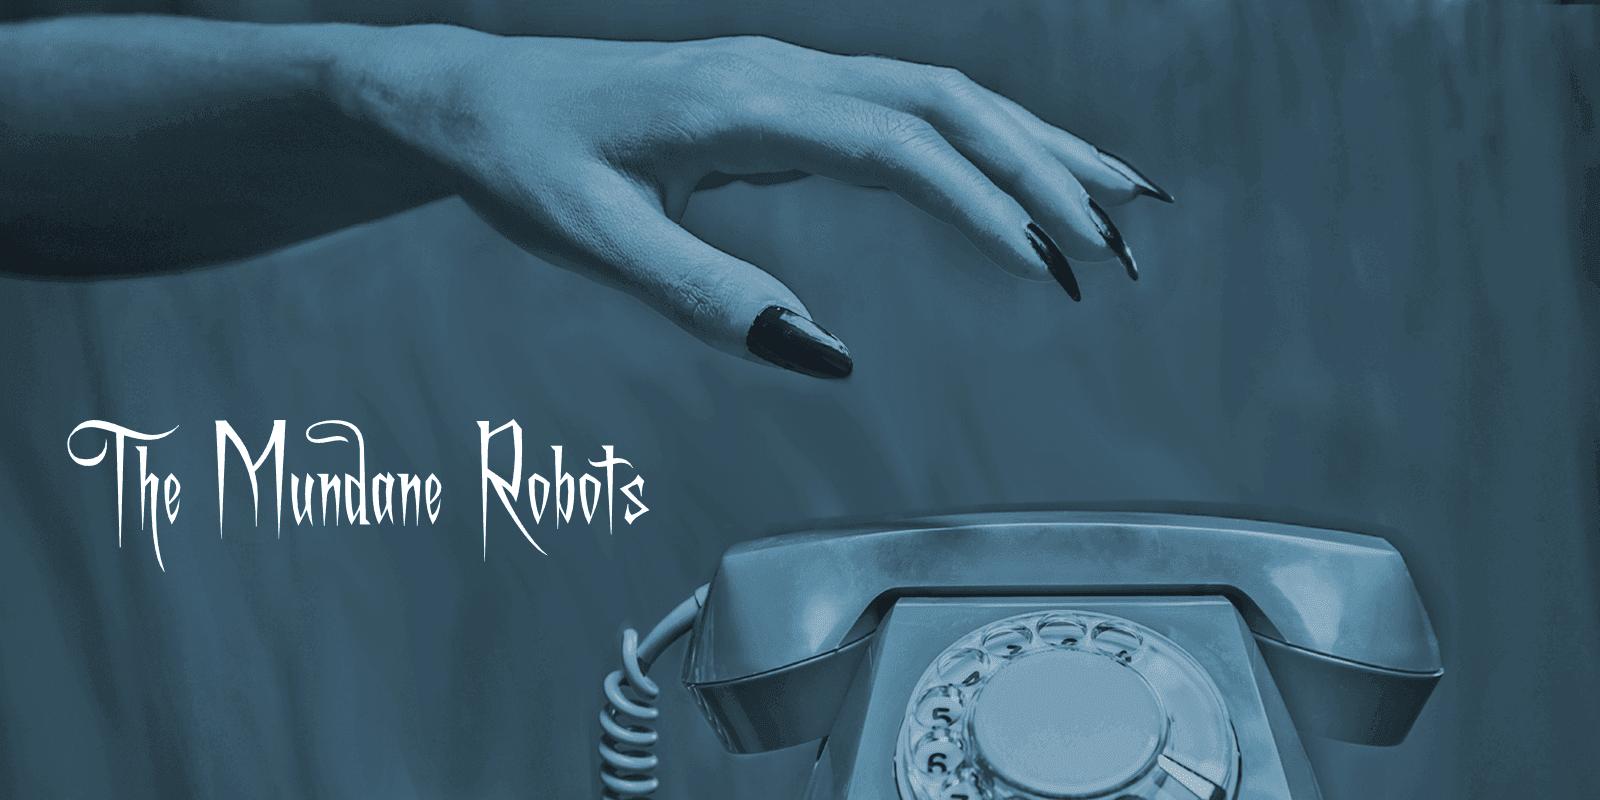 Customer Service Horror Stories: The Mundane Robots